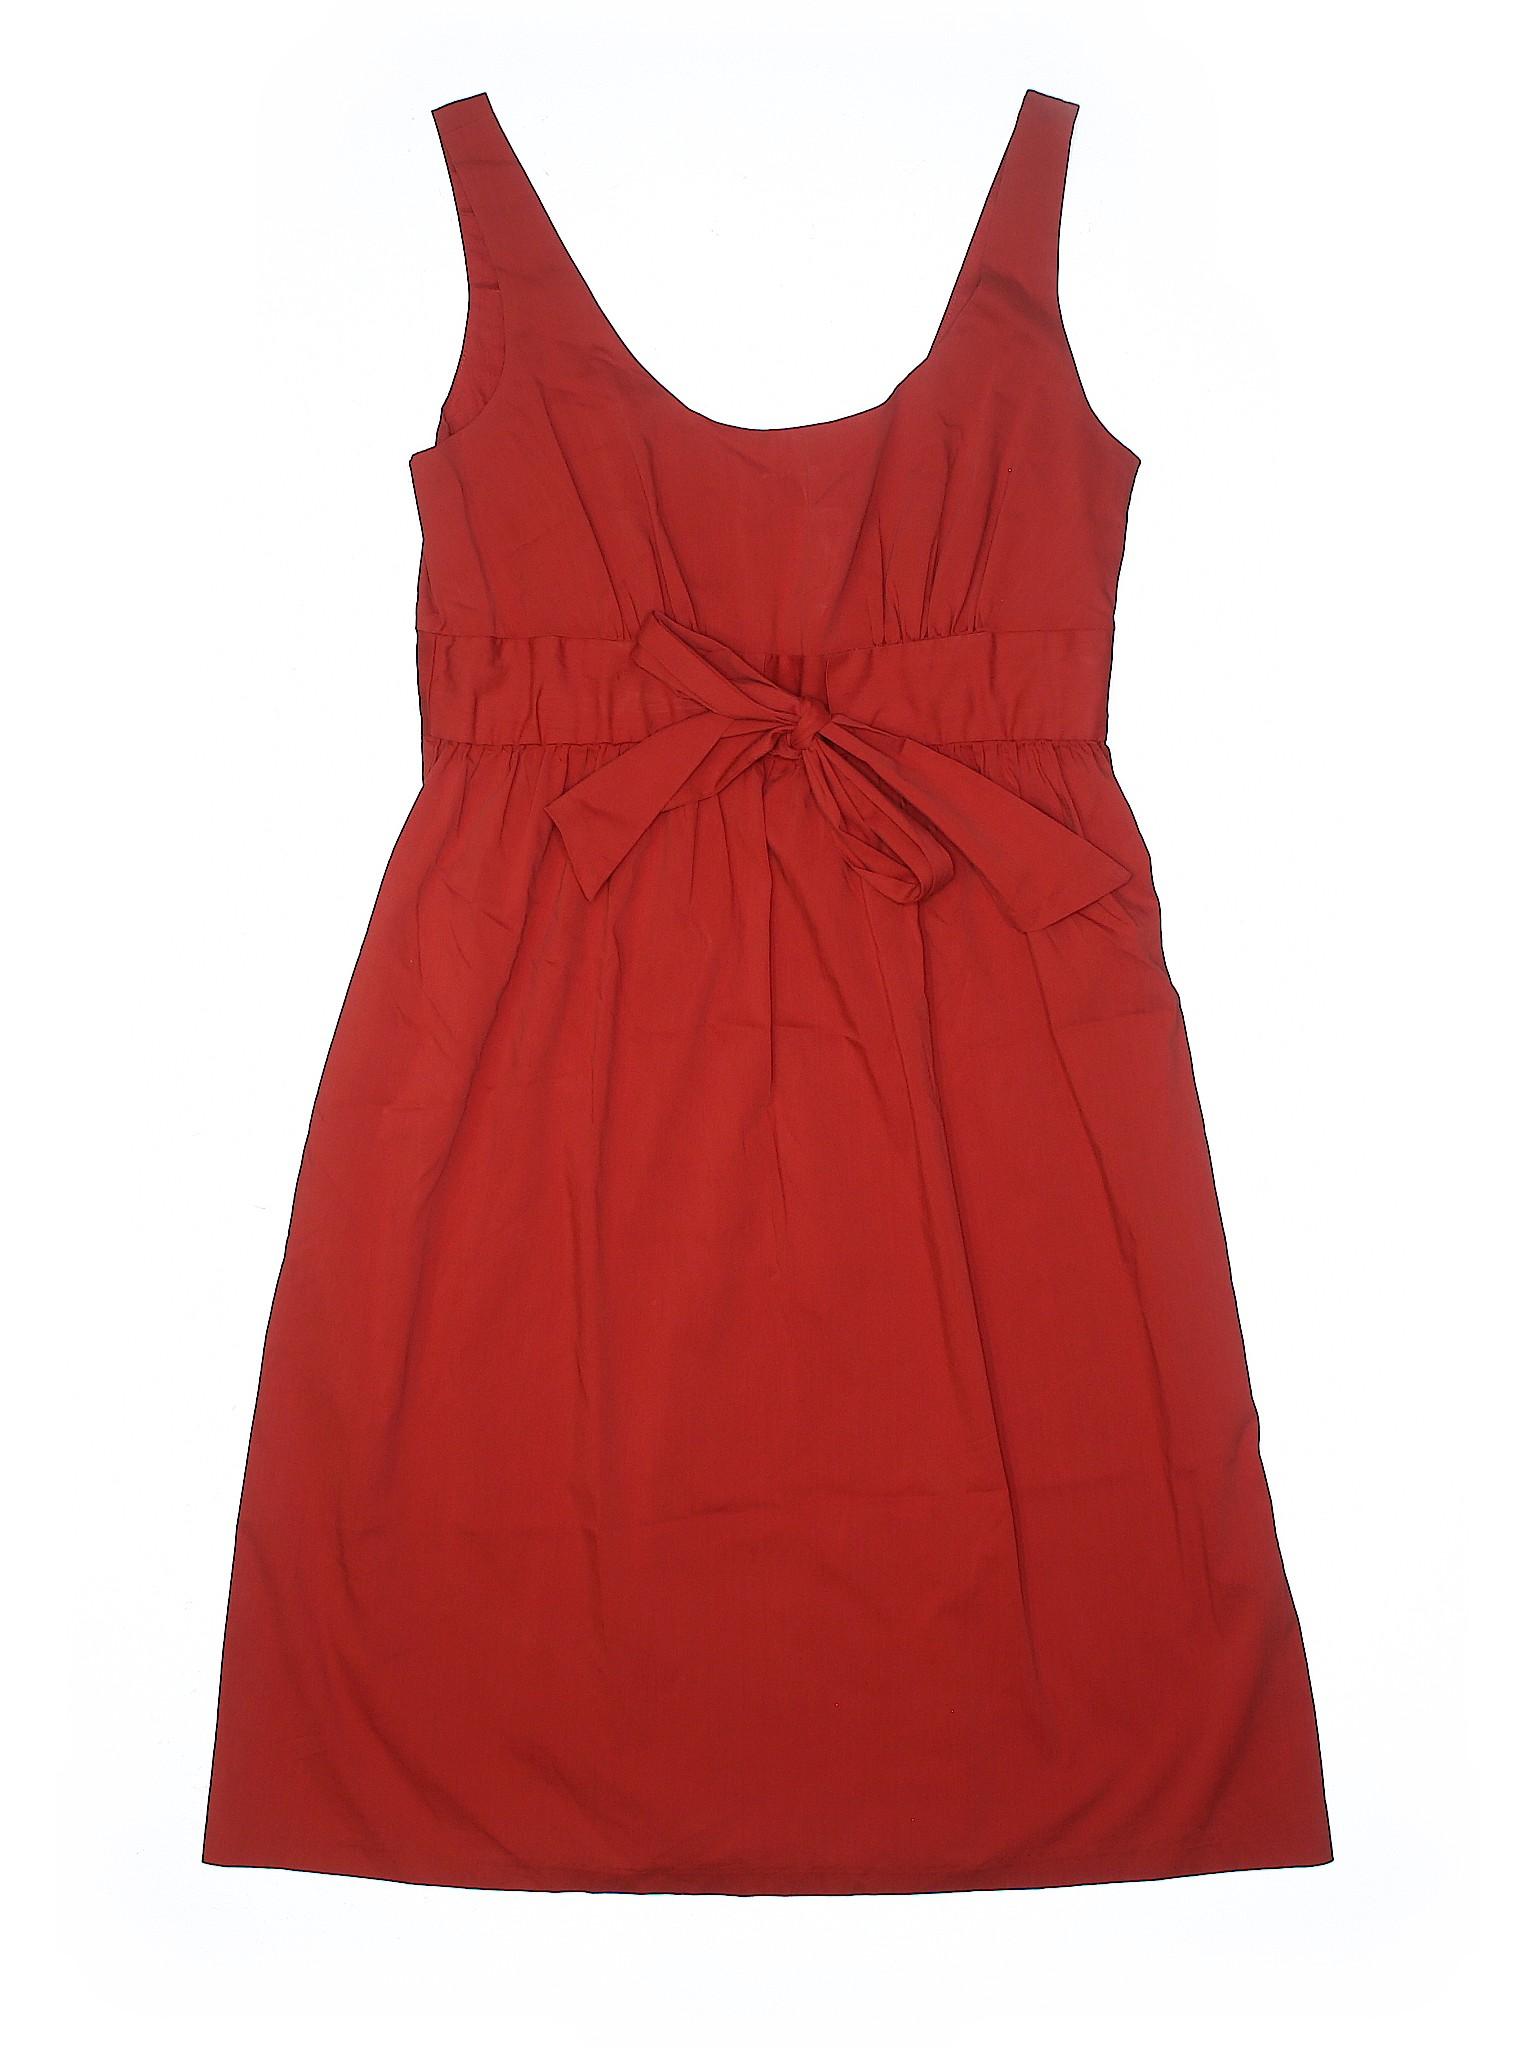 winter 21 Casual Dress Forever Boutique dwqXSUnxd